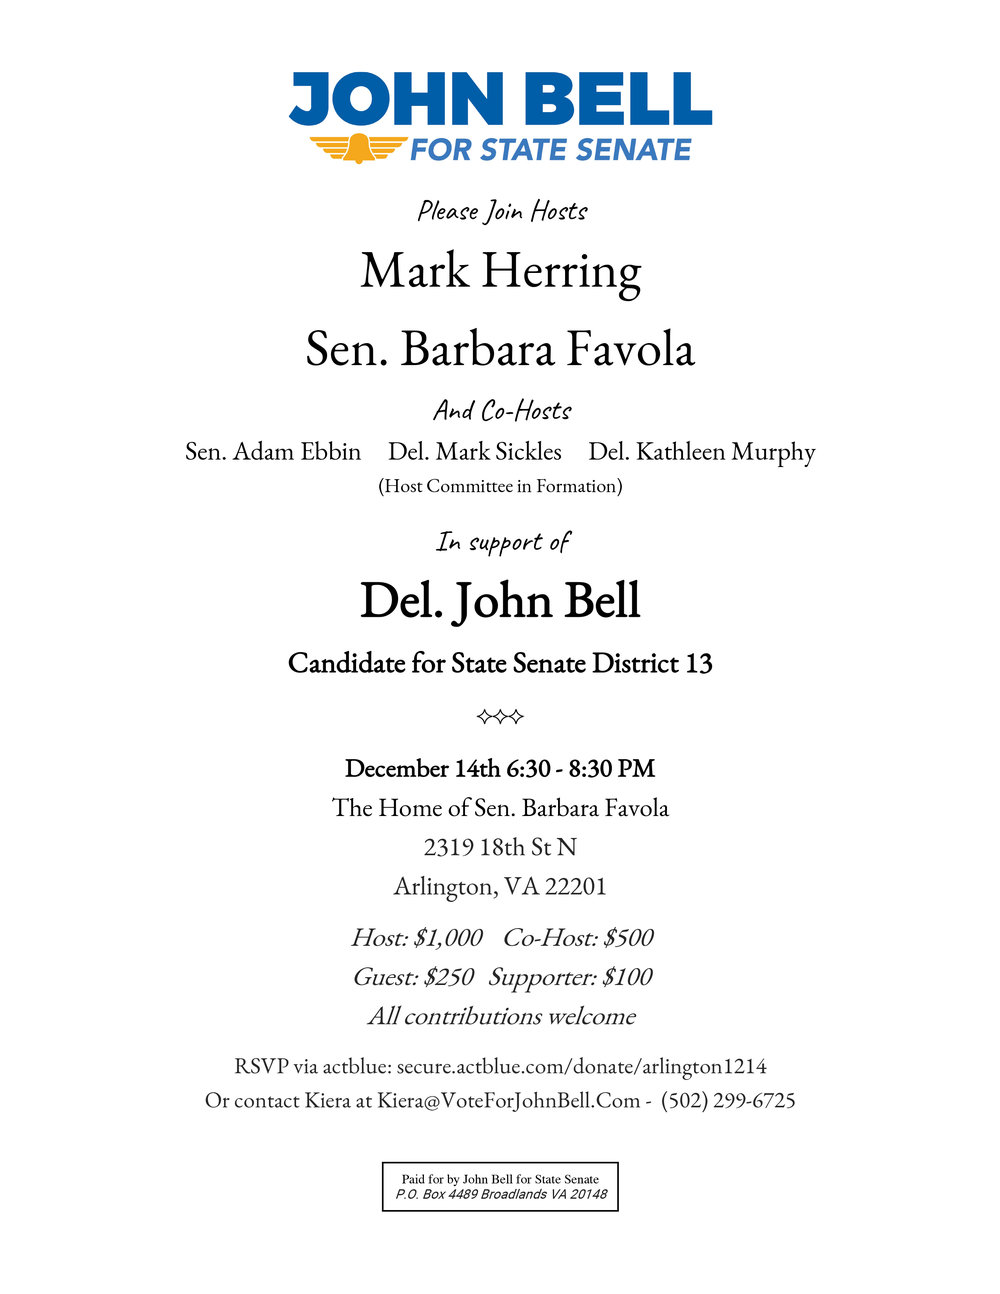 Herring_Favola Invite (1 Page).jpg